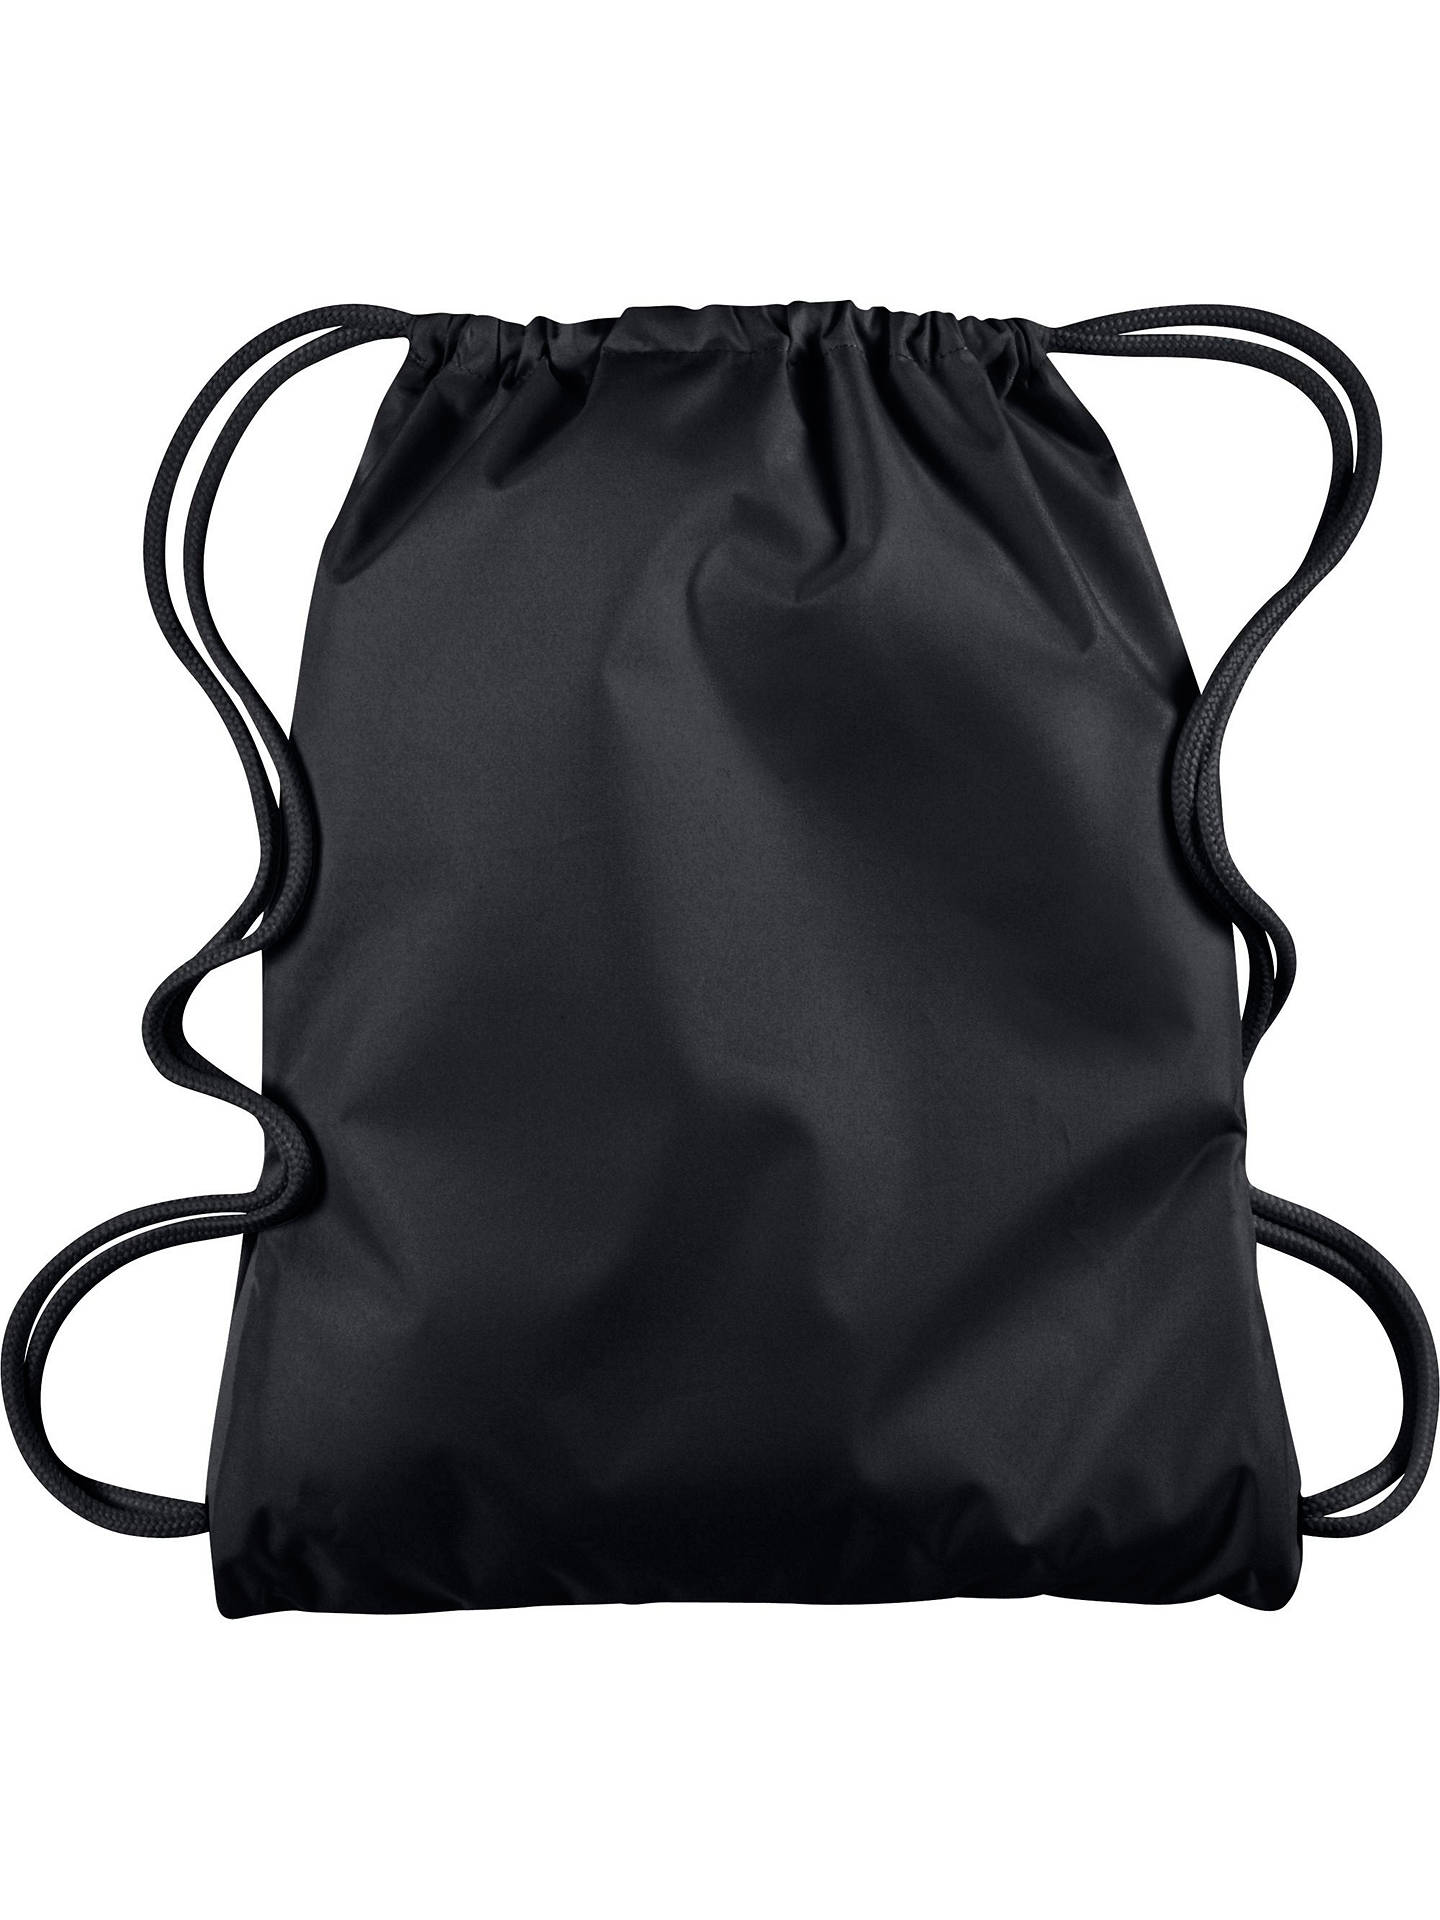 Nike Mercurial 2.0 Football Drawstring Bag, Black at John